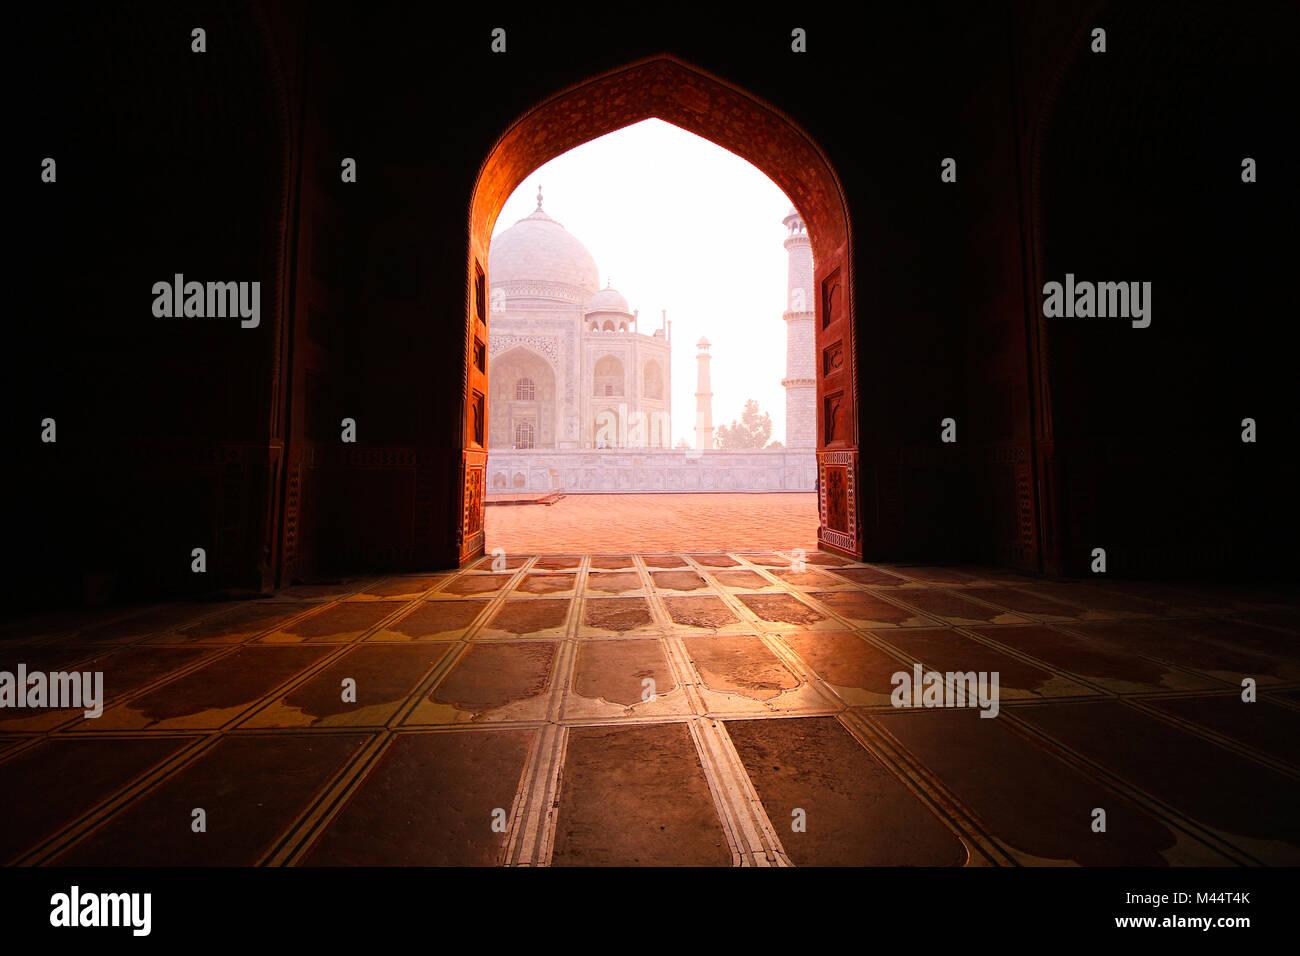 Vista del Taj Mahal desde la mezquita, Agra, Uttar Pradesh, India Imagen De Stock